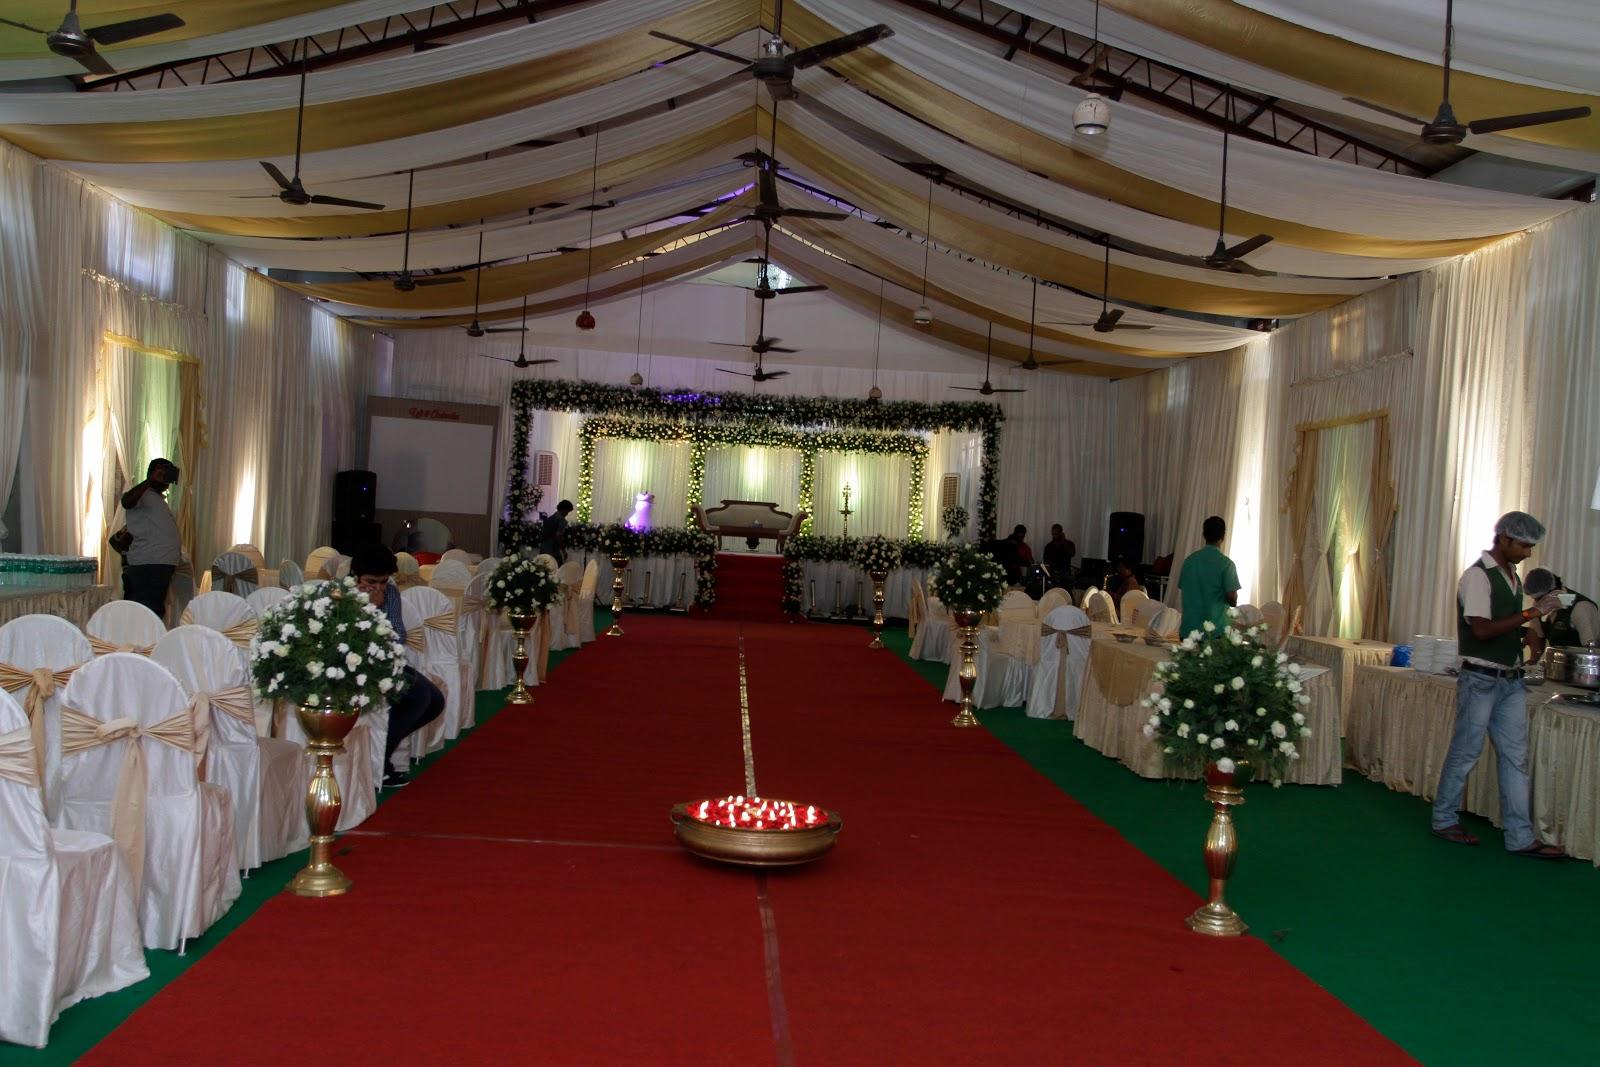 wedding planner pathanamthitta +f,  wedding planner pathanamthitta + g,  wedding planner pathanamthitta + h,  wedding planner pathanamthitta + i,  wedding planner pathanamthitta + j